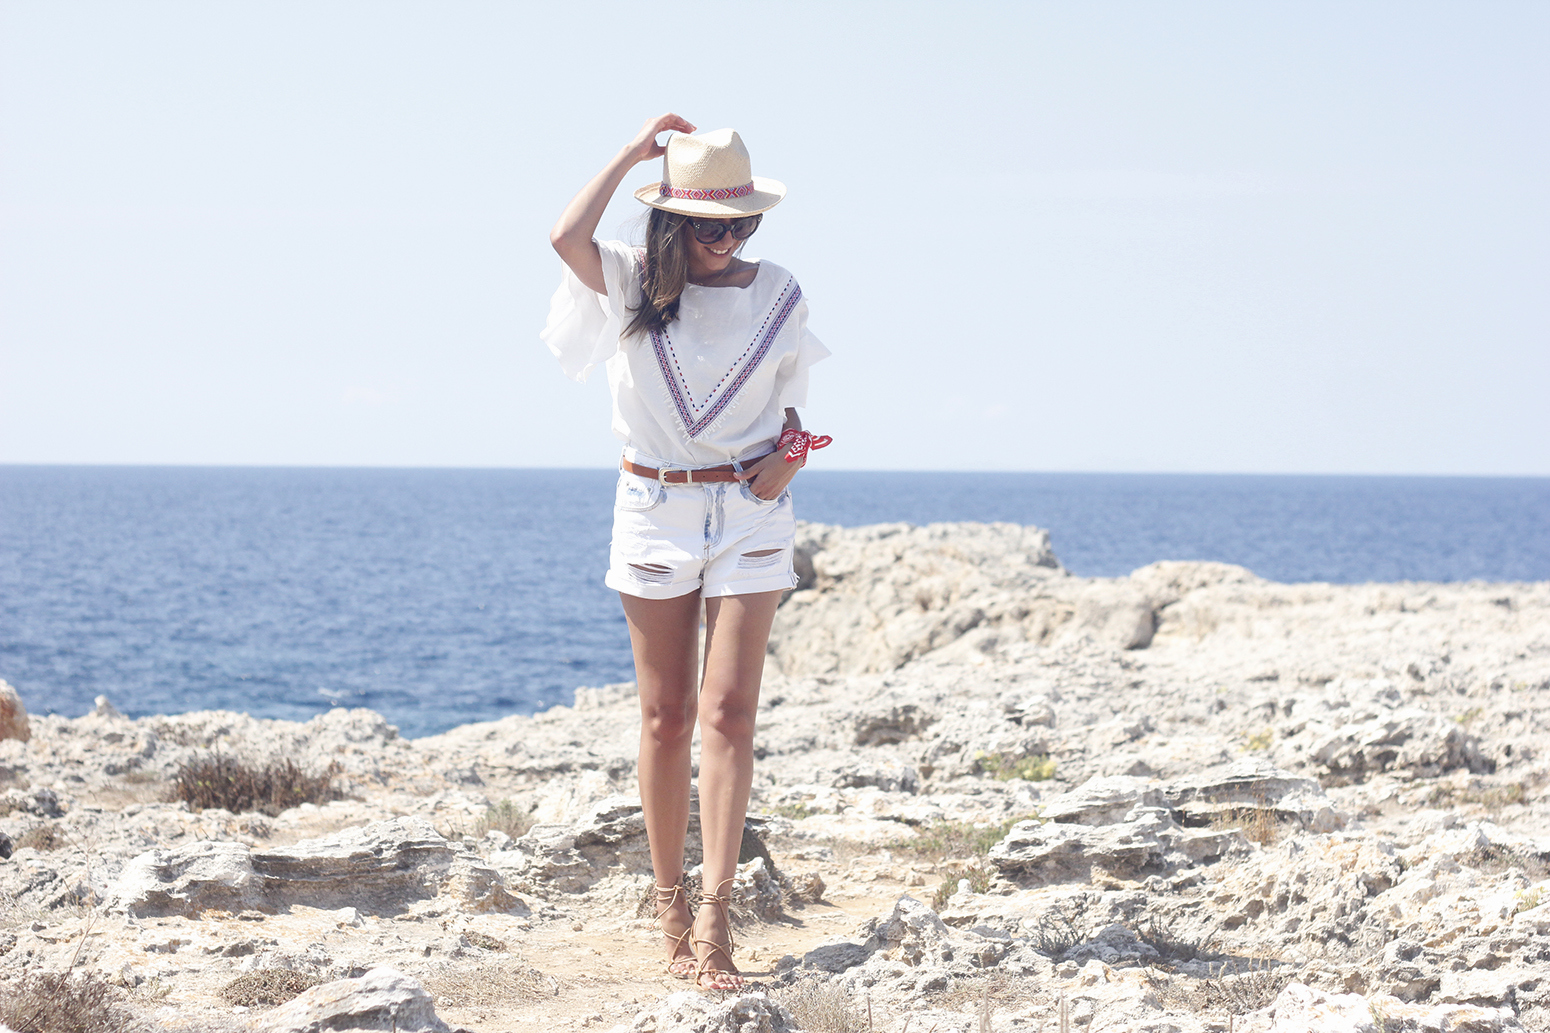 White Summer look bandana beach outfit08